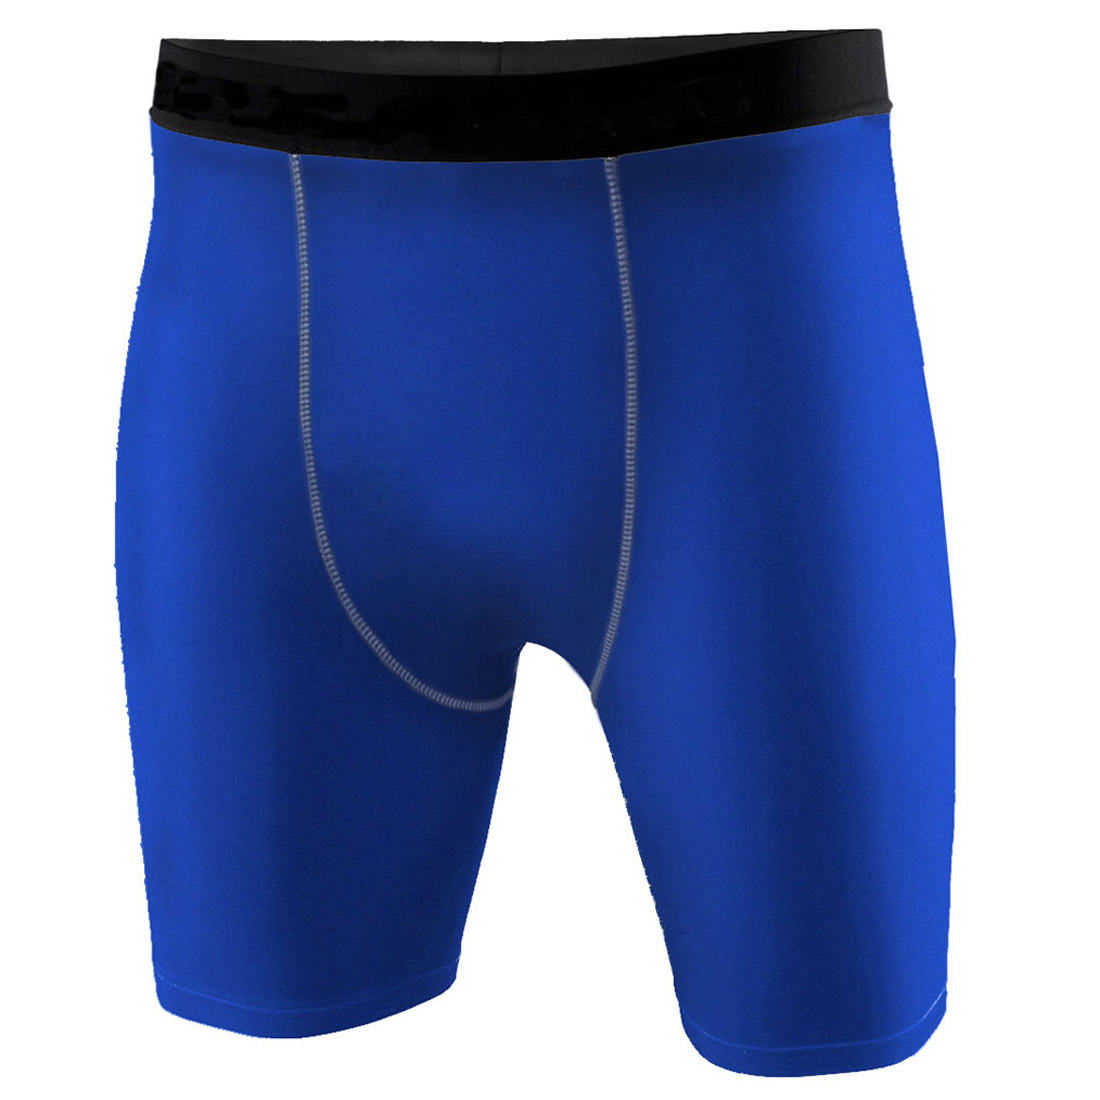 mens compression pants under shorts